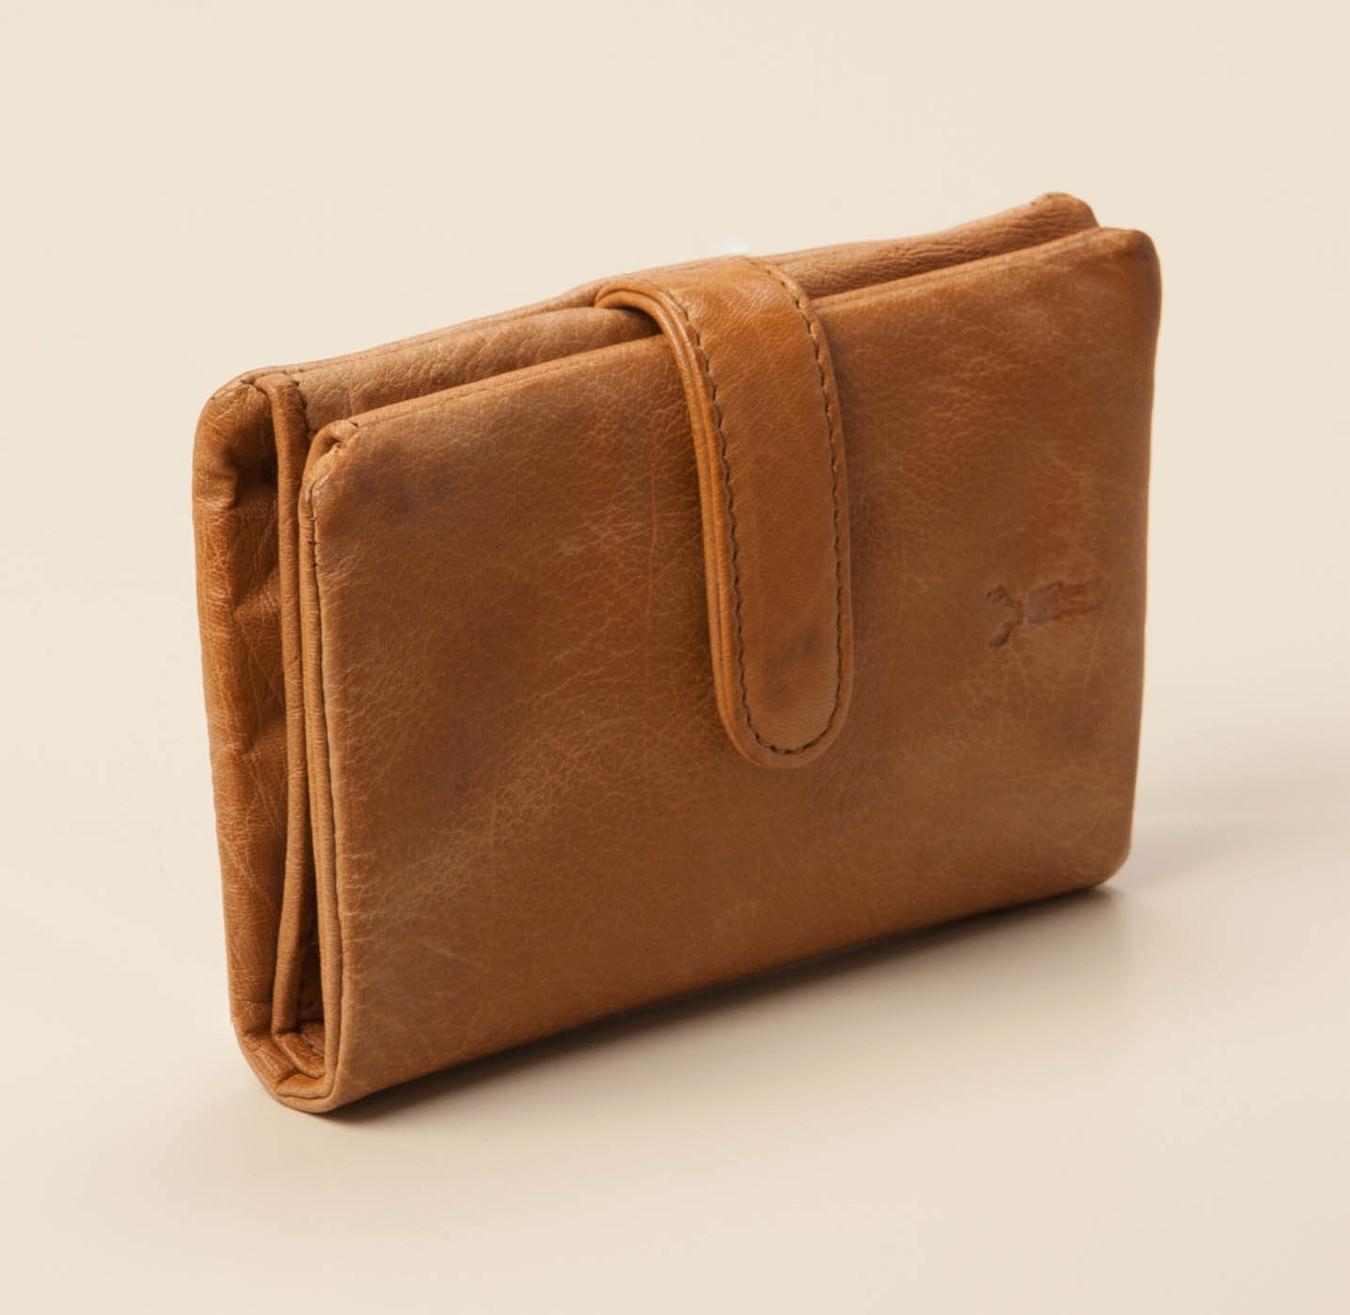 4c53e6349ba4b Jack Kinsky Damen-Acces. Portemonnaie in cognac kaufen